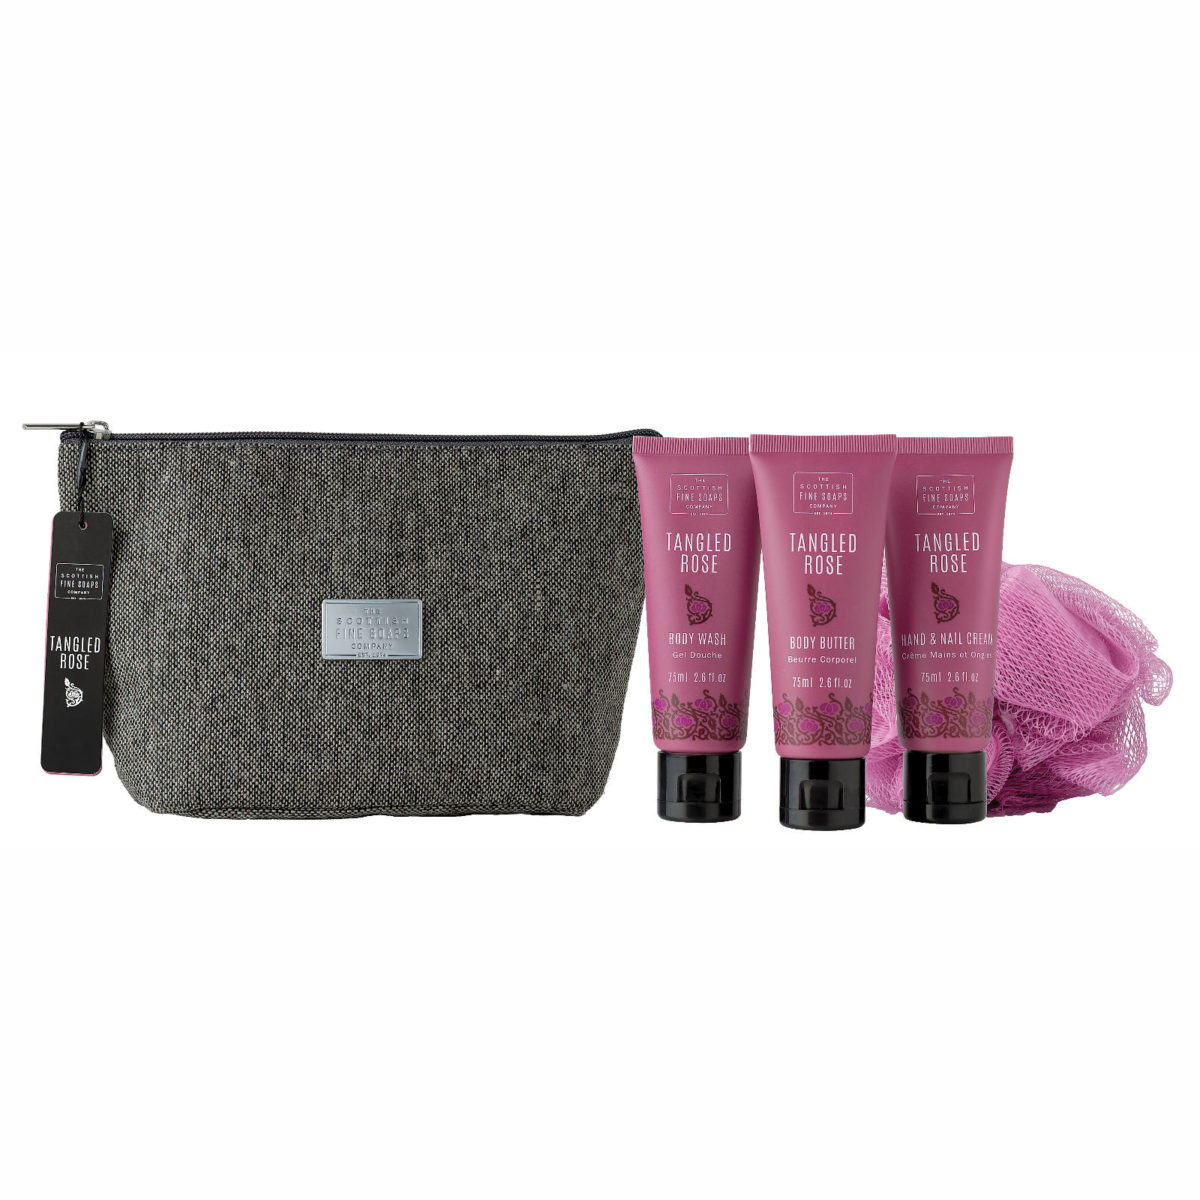 Tangled Rose Toiletry Bag Gift Set